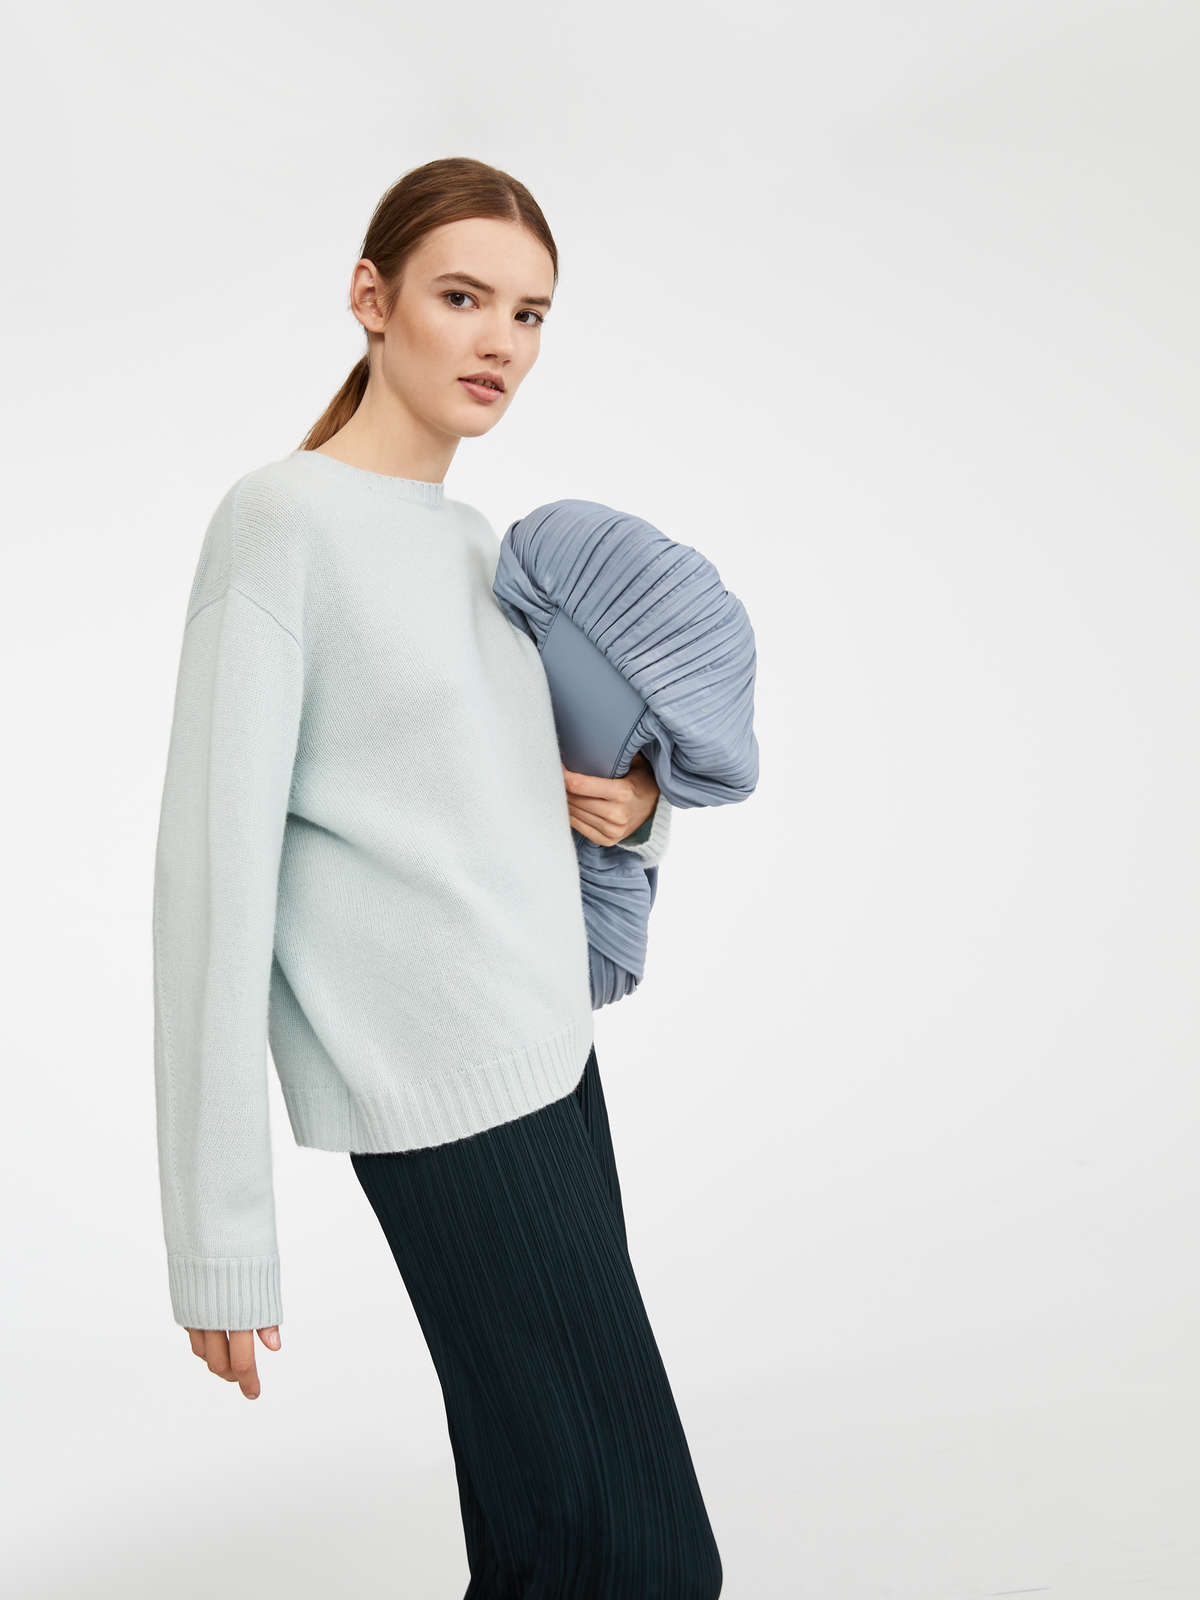 e1868a978277e5 Women's Knitwear and Tricot | New 2019 Collection | Max Mara